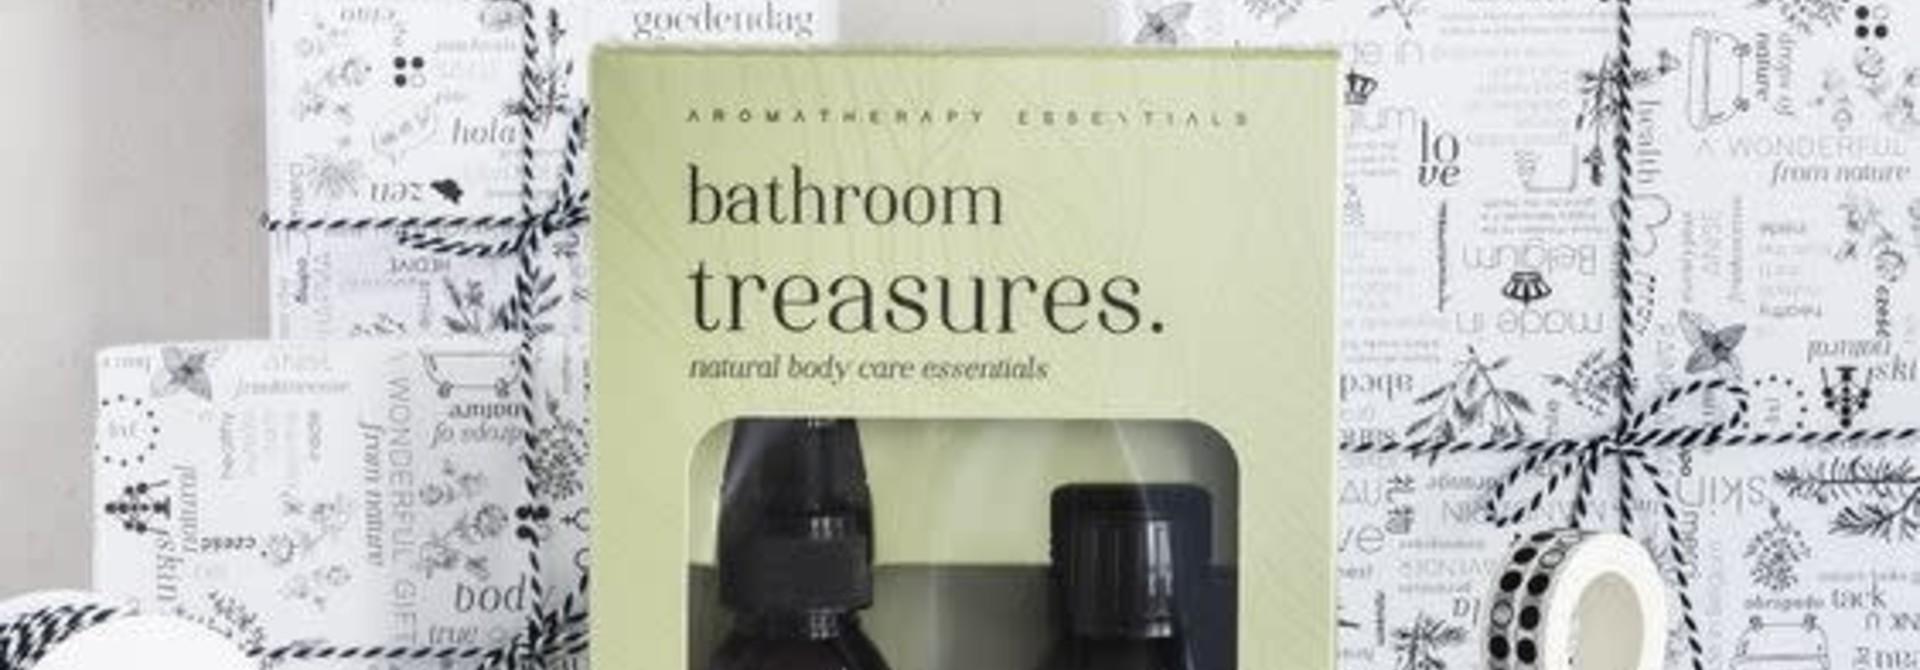 Bathroom Treasures natural body care essentials